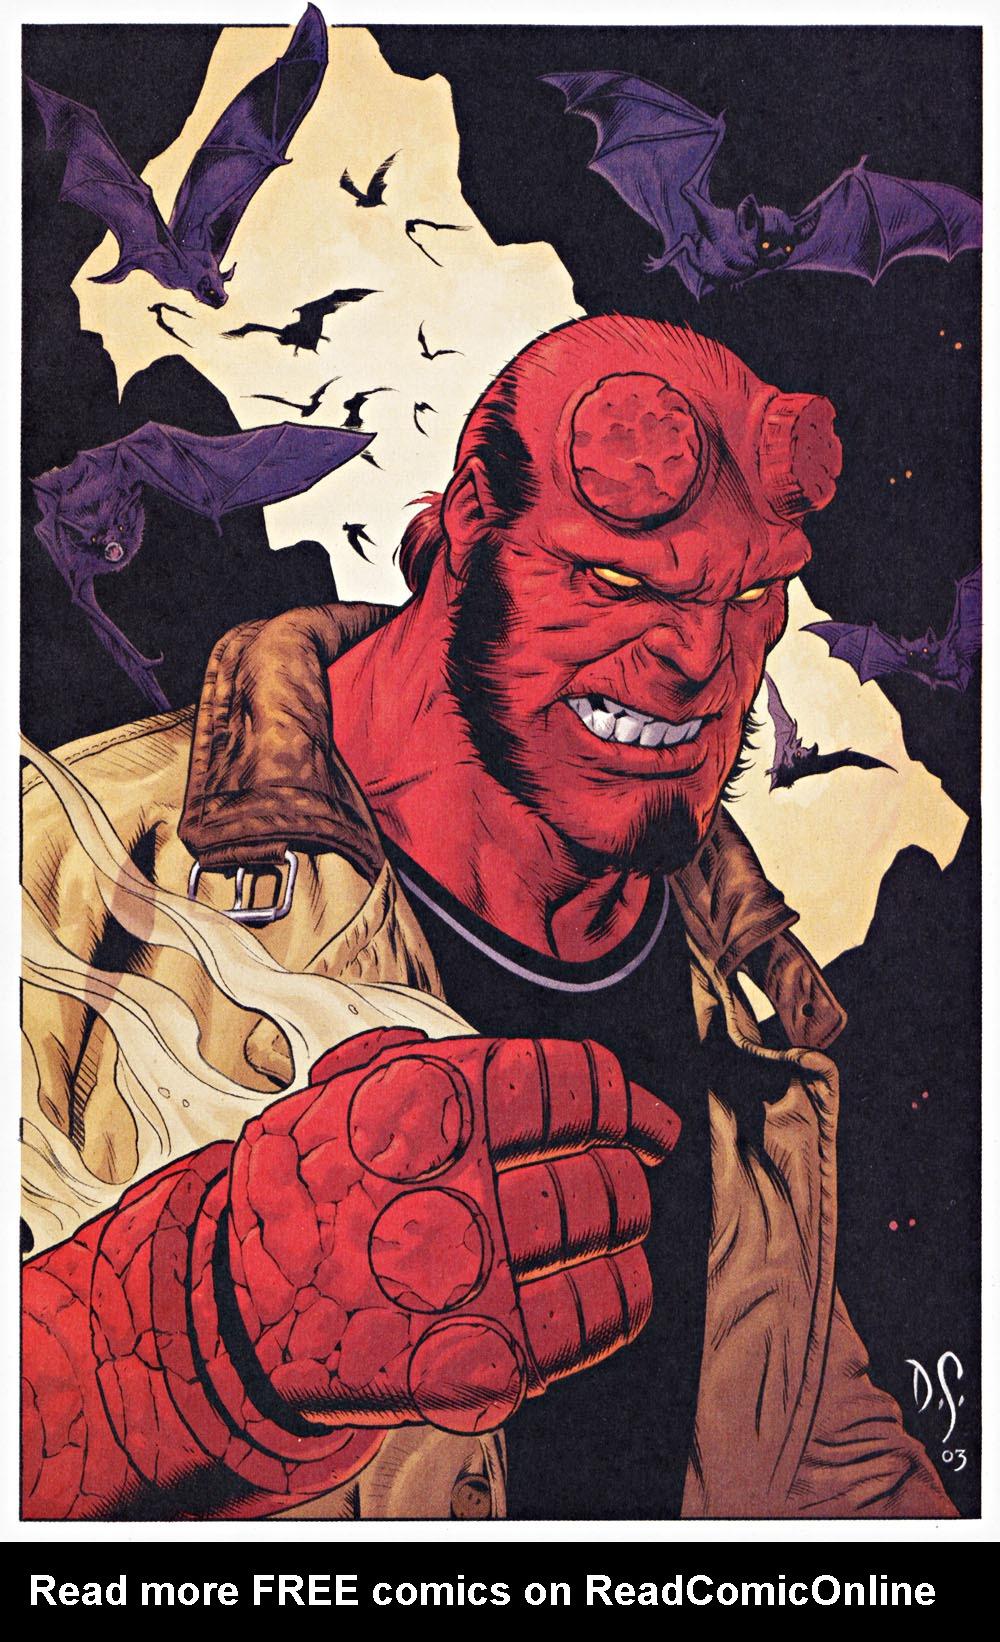 Read online Hellboy: Weird Tales comic -  Issue #7 - 29